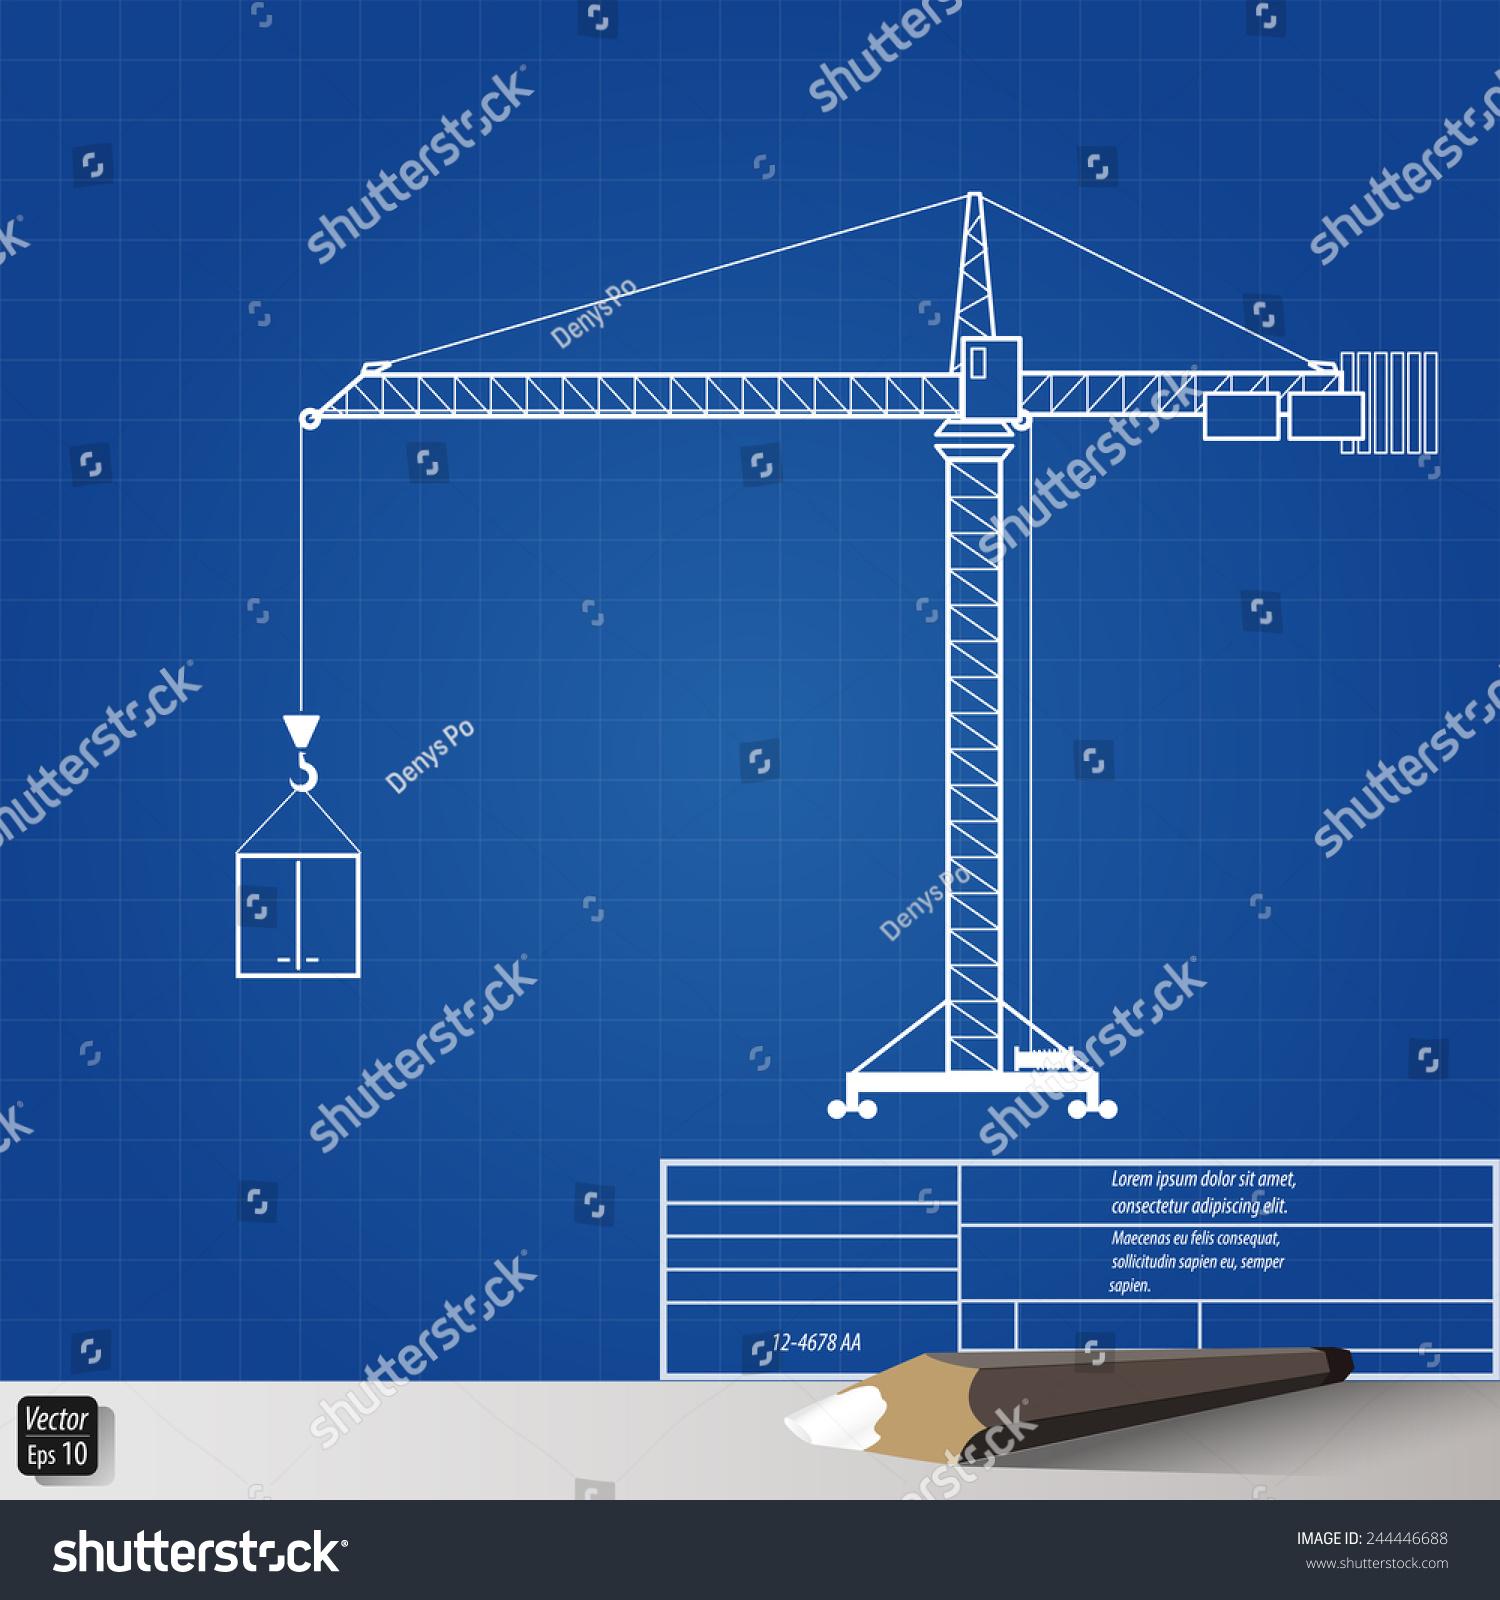 Blueprint drawing tower crane vector illustration stock vector blueprint drawing tower crane vector illustration eps 10 malvernweather Choice Image